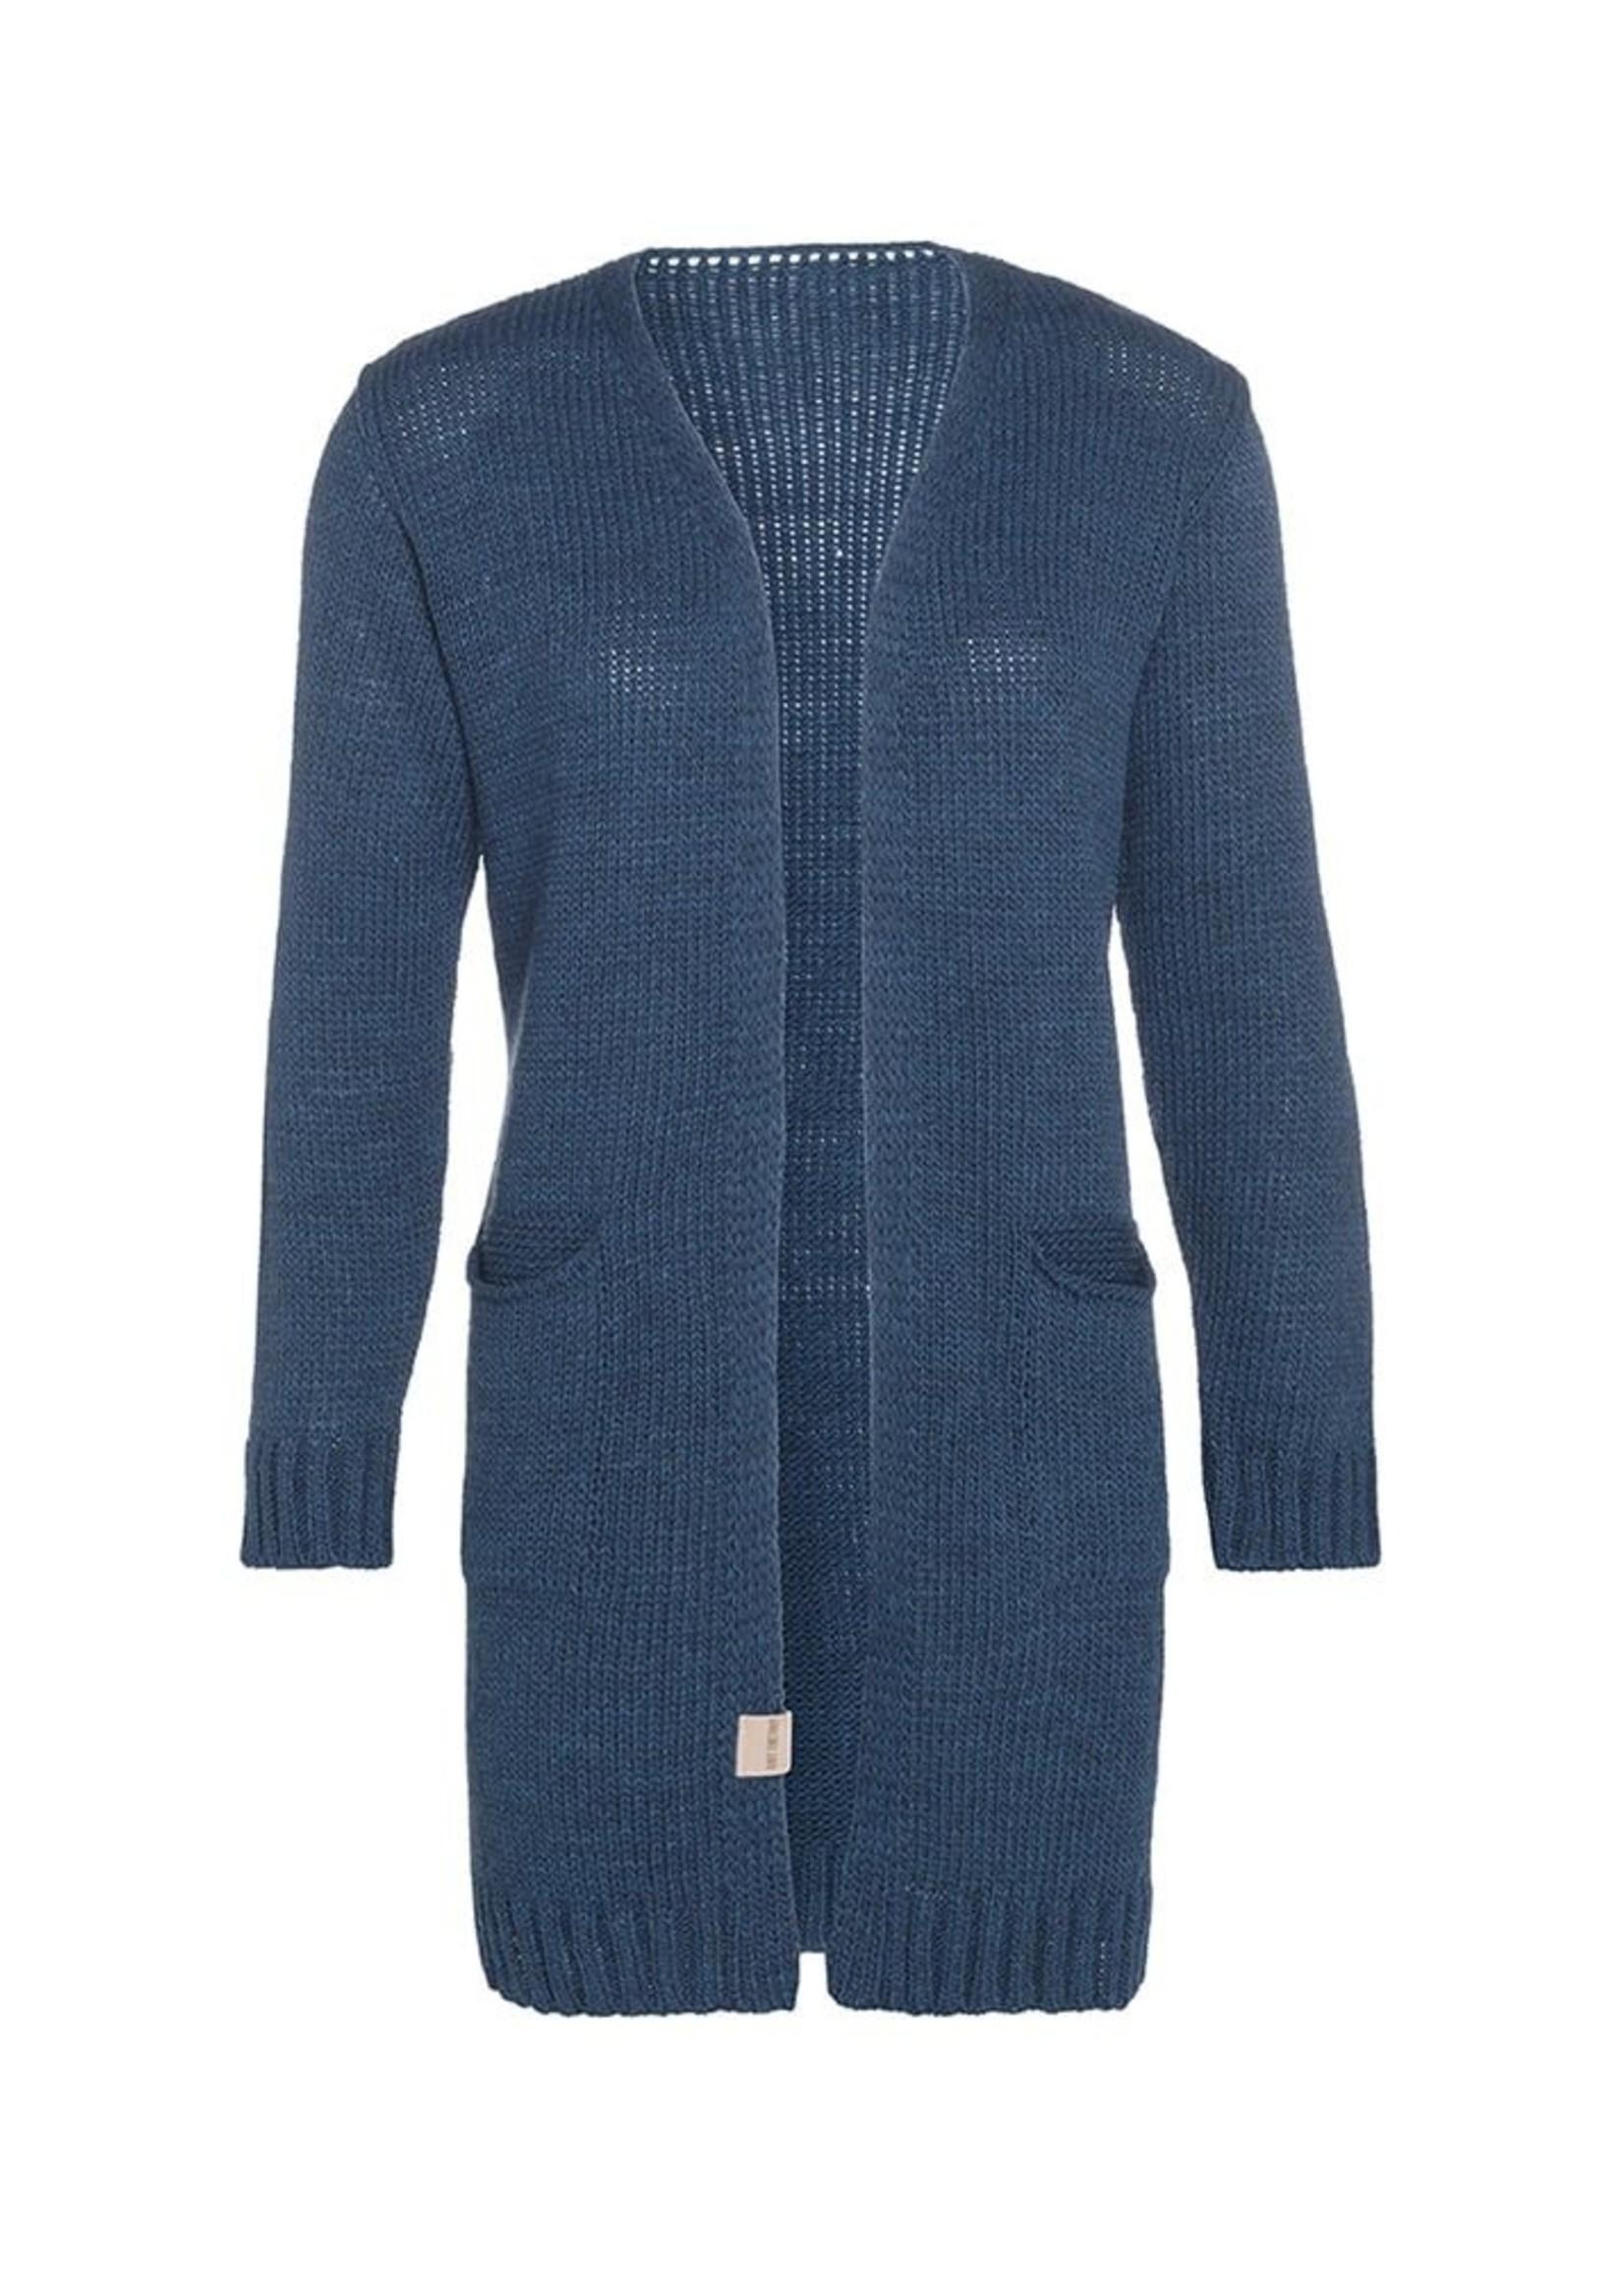 Knit Factory Knit Factory - Ruby gebreid vest met steekzak -  Petrol